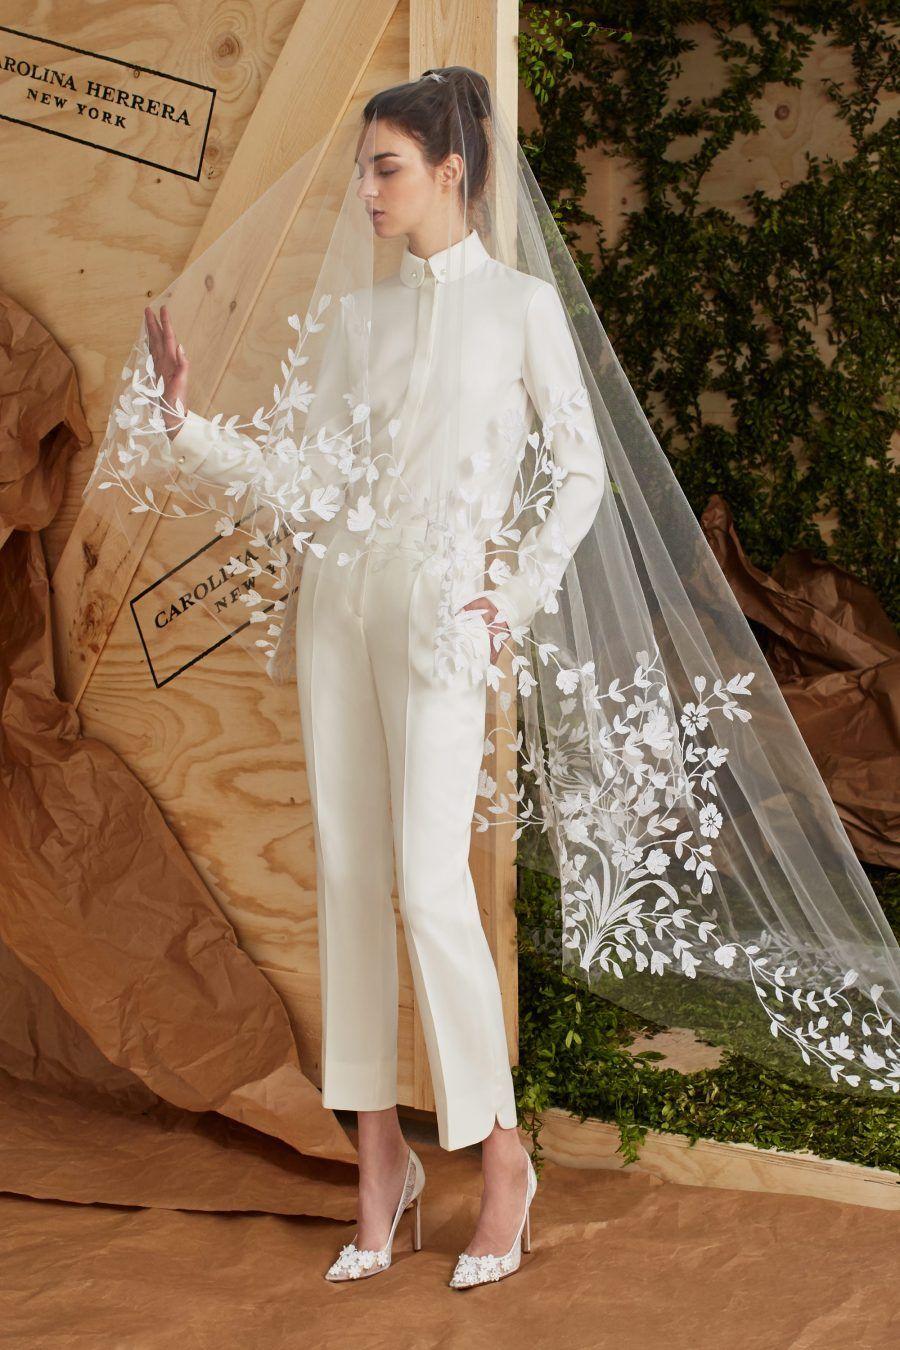 Assez Gli abiti da sposa alternativi più belli | Bigodino CV11